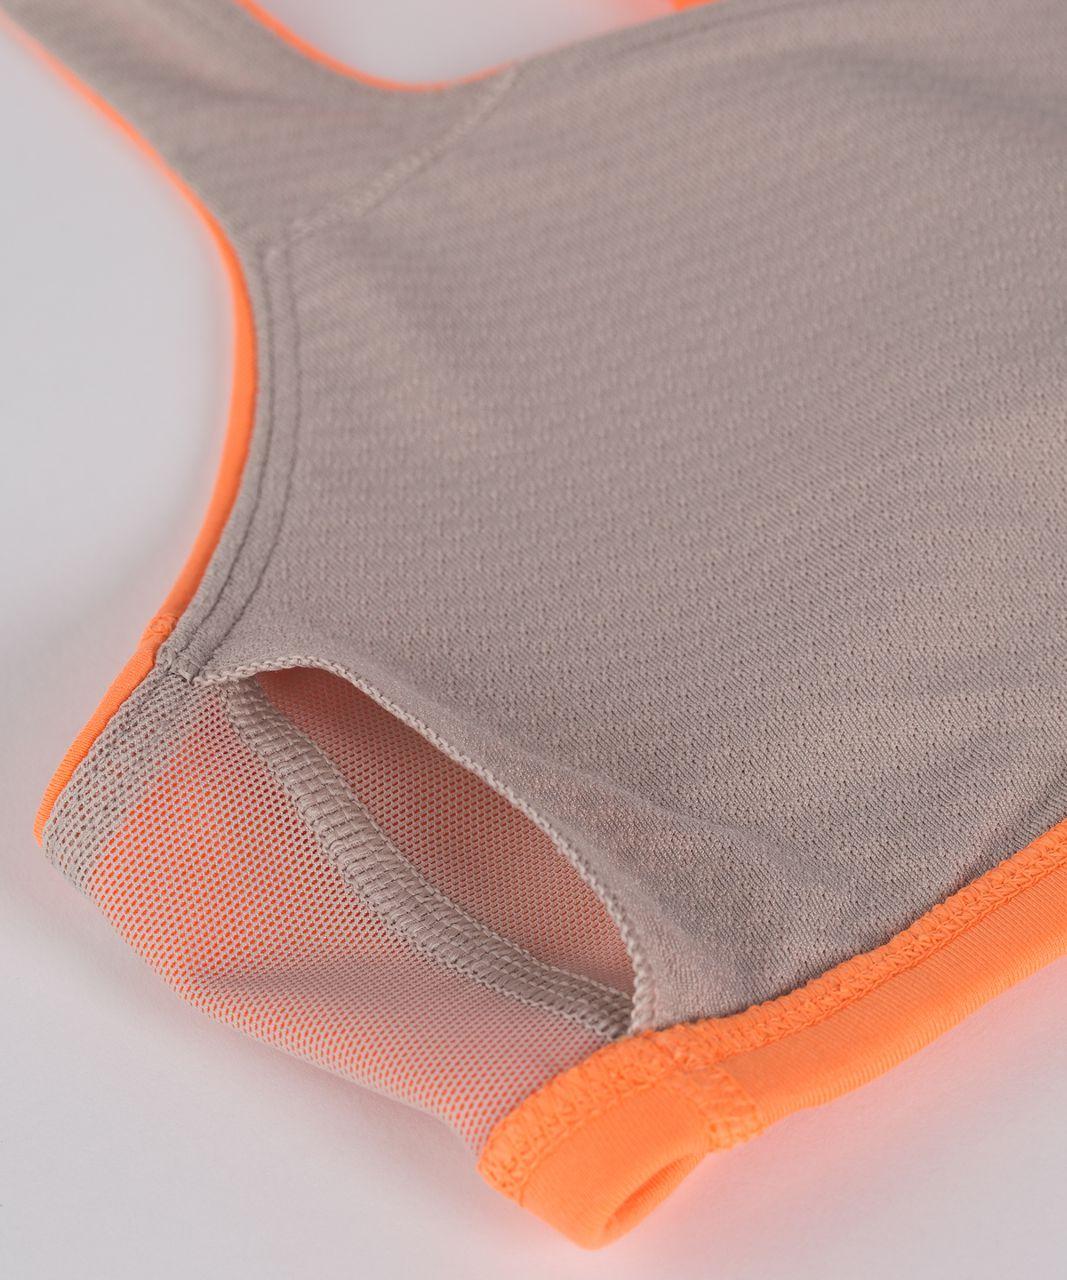 Lululemon Free To Be Bra - Filtered Orange